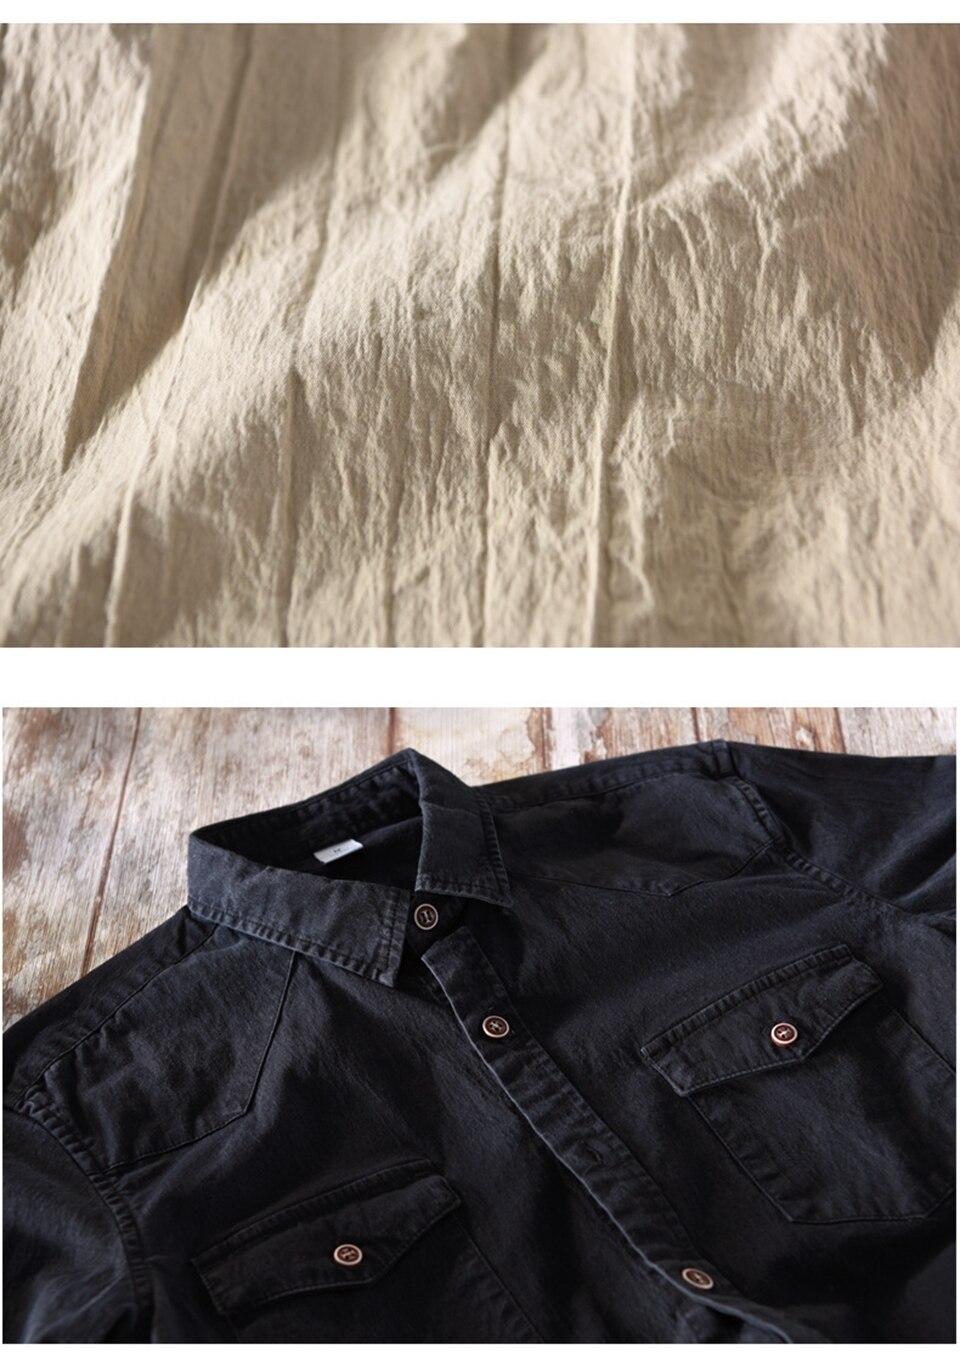 97% Cotton 3% Spandex Man Denim Shirt Quality Spring Autumn Long Sleeve Male Pocket Army Green Men Jean Casual Cowboy Shirts